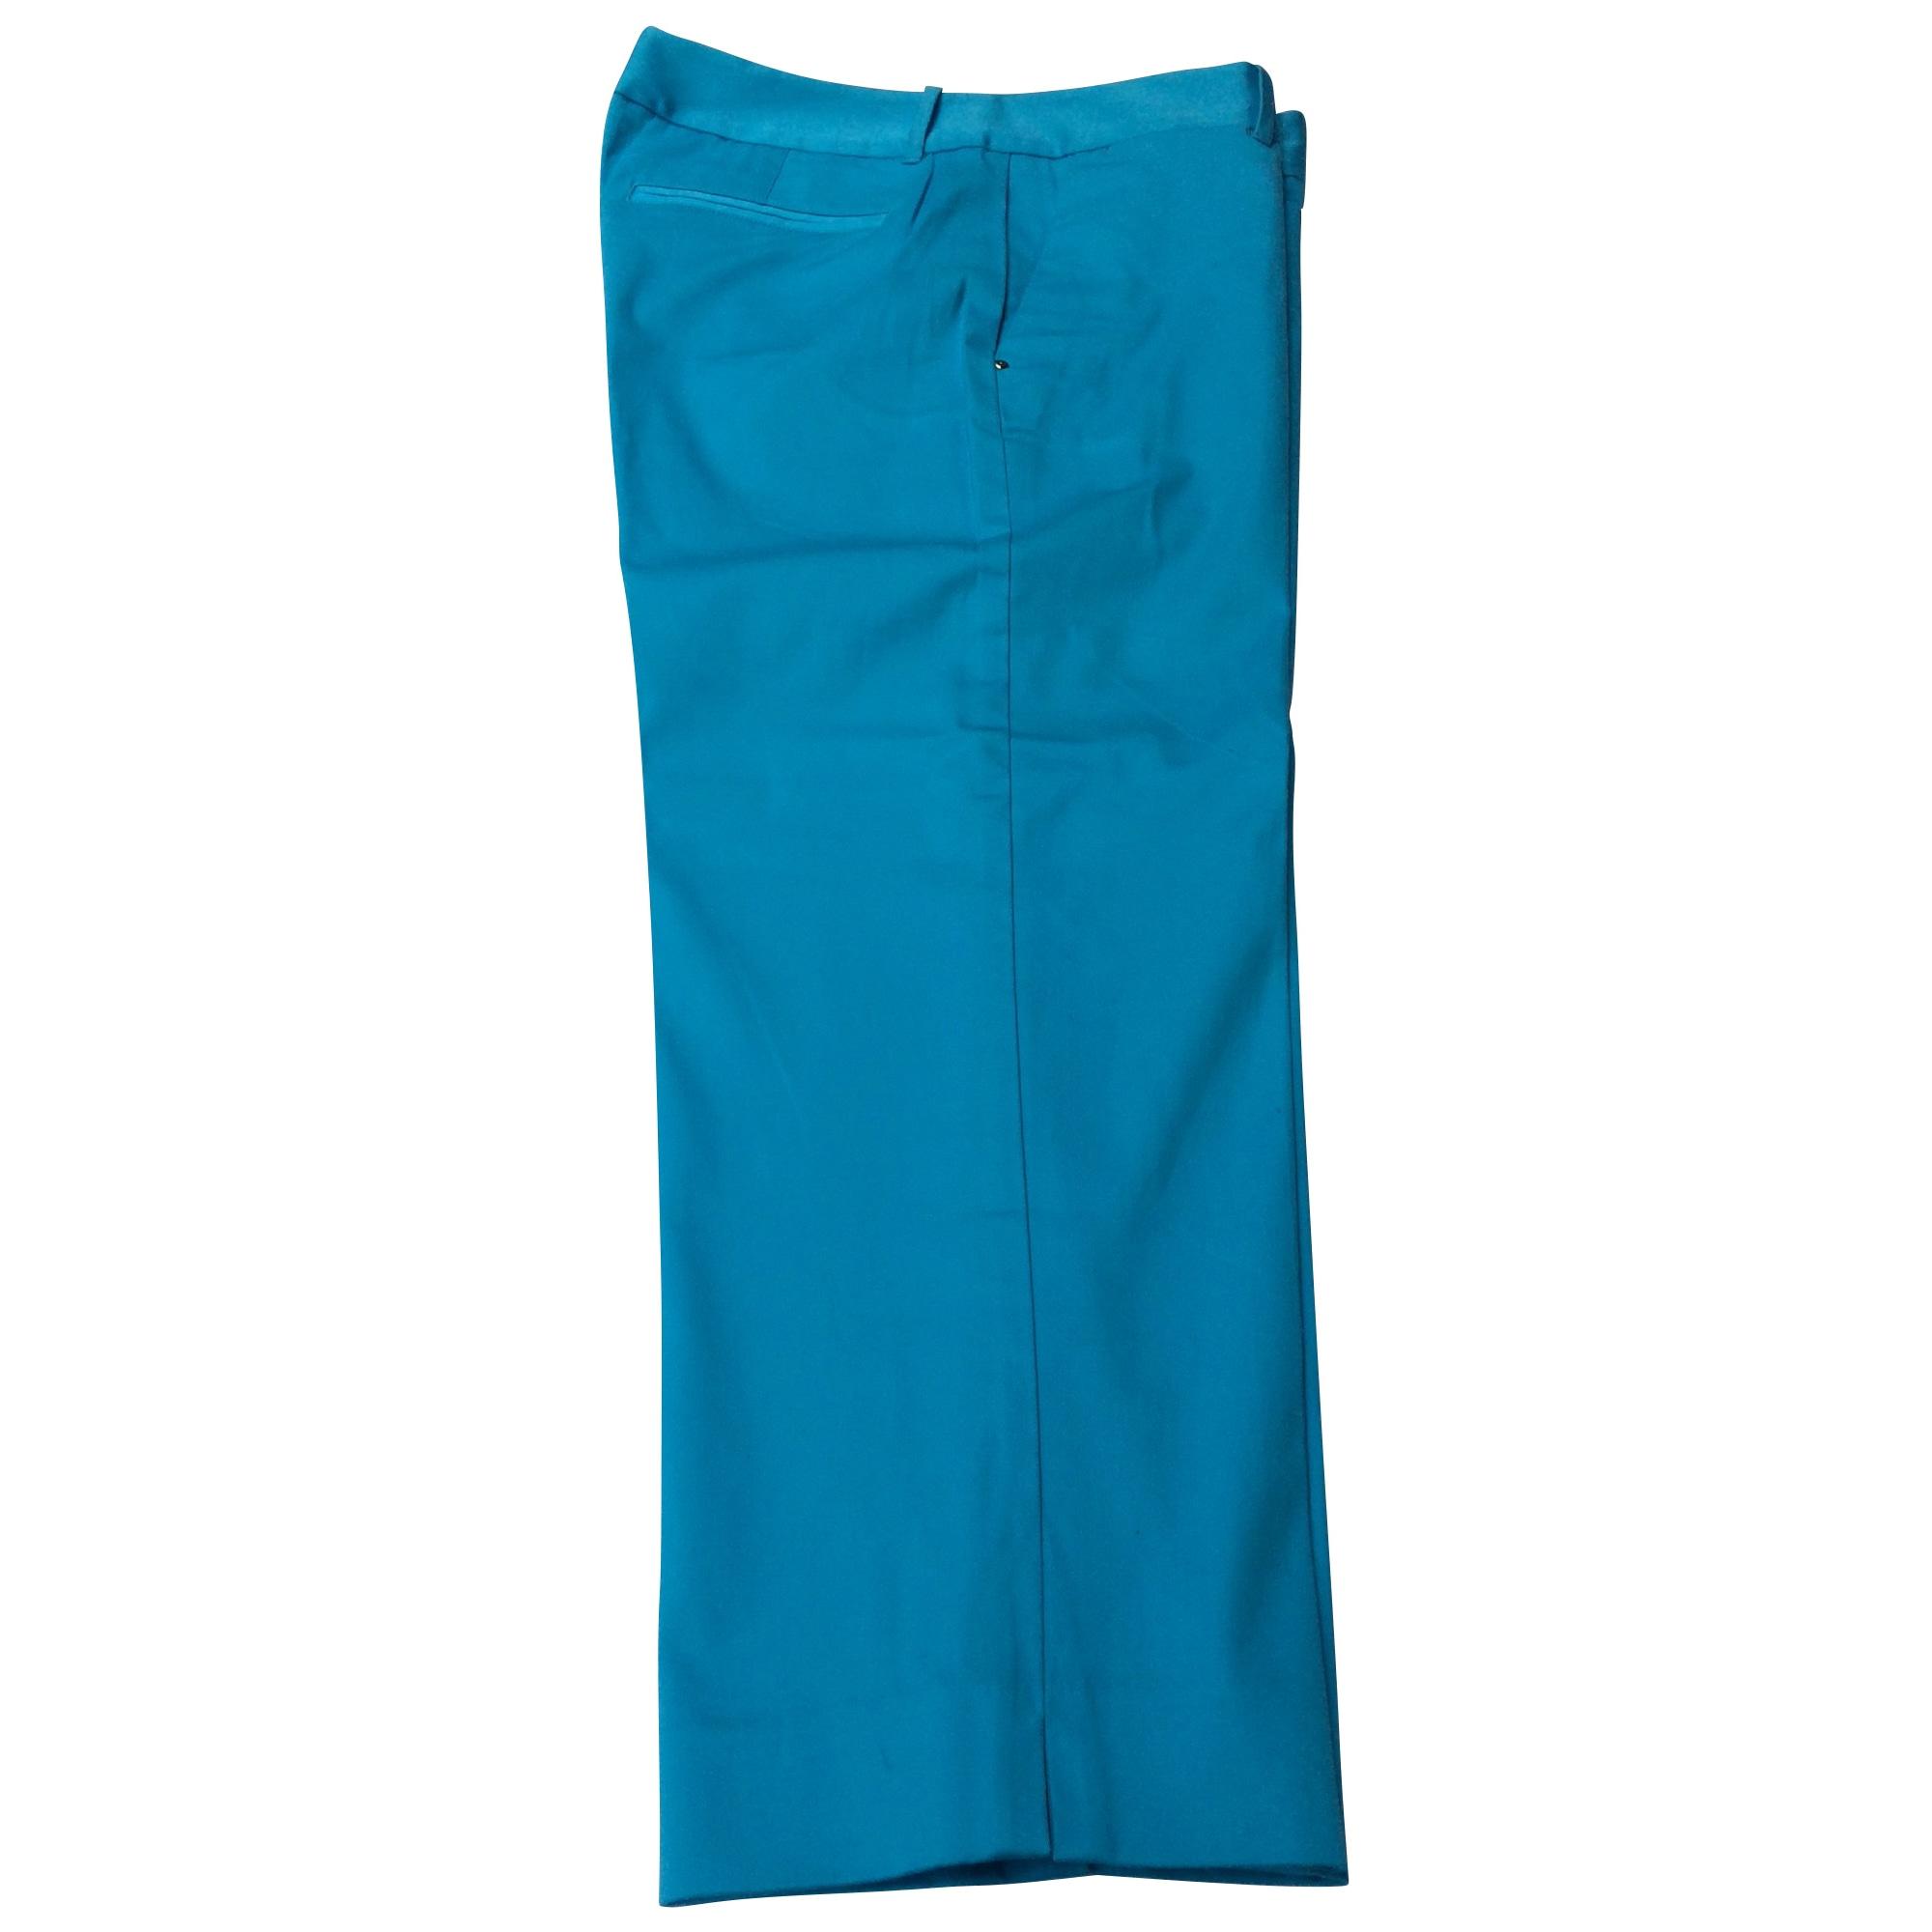 Pantalon droit RALPH LAUREN Bleu, bleu marine, bleu turquoise